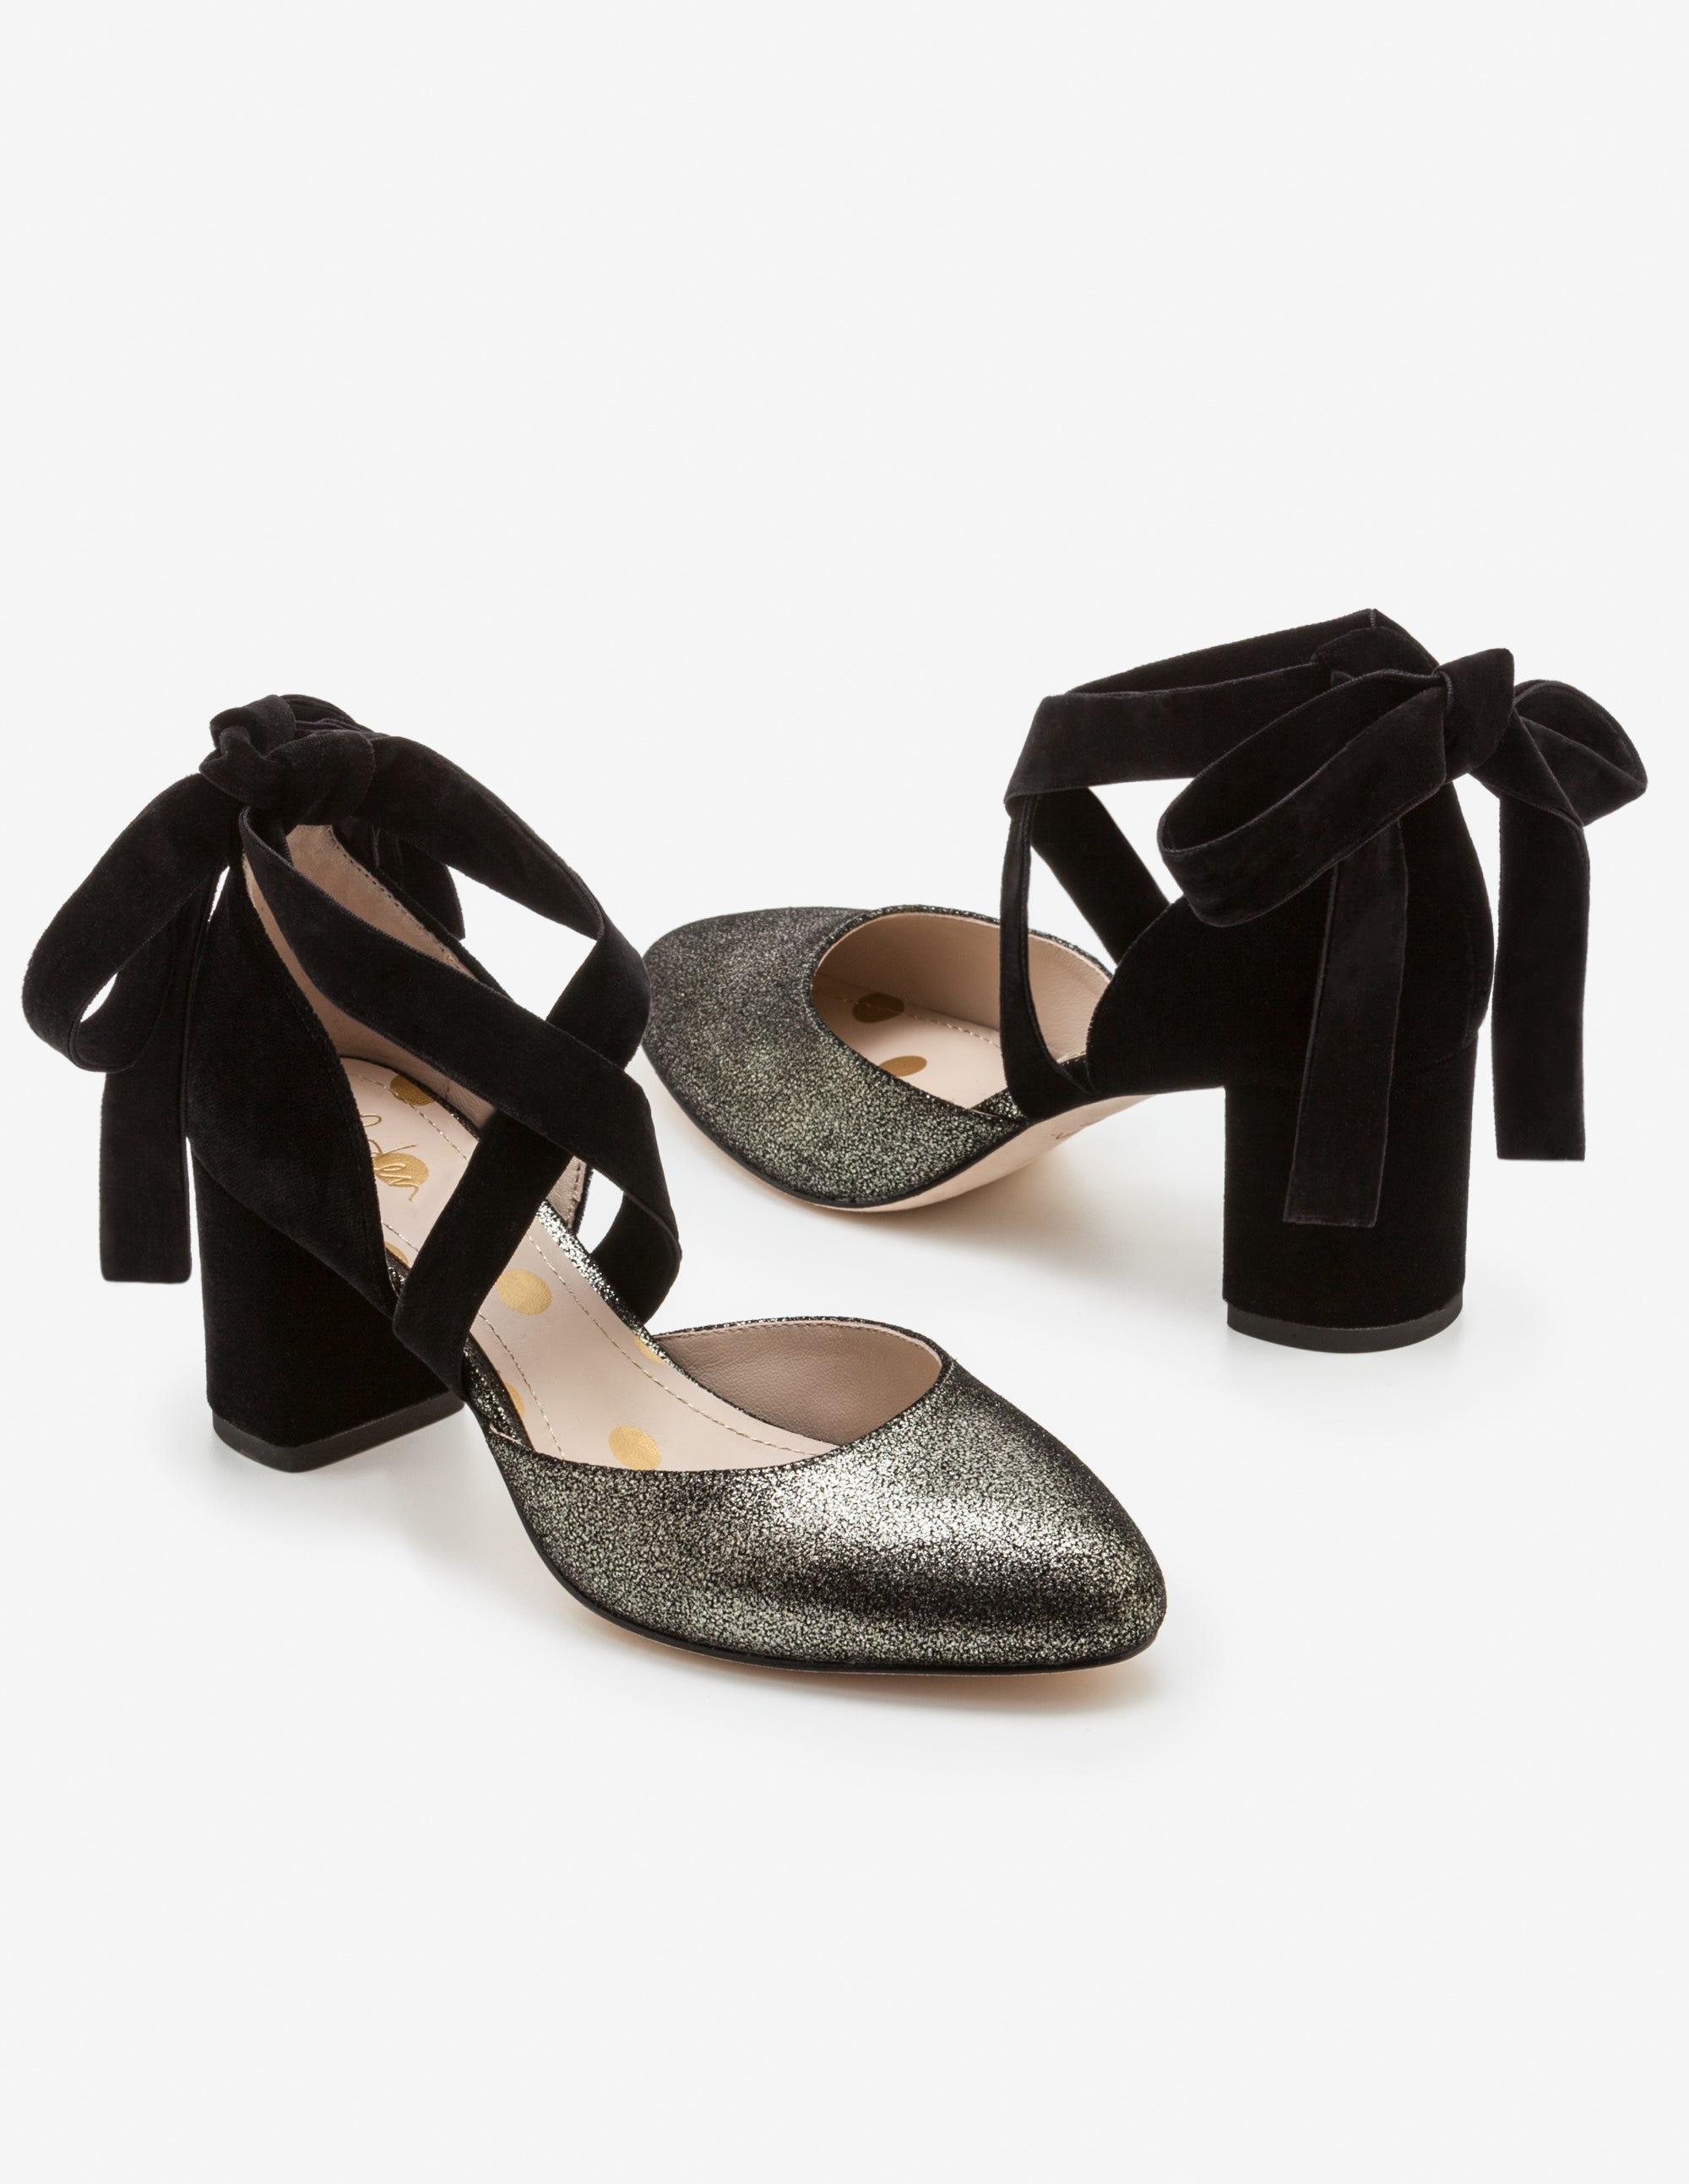 f65250cefd7 Phoebe Mid Heels - Antique Gold Metallic Black